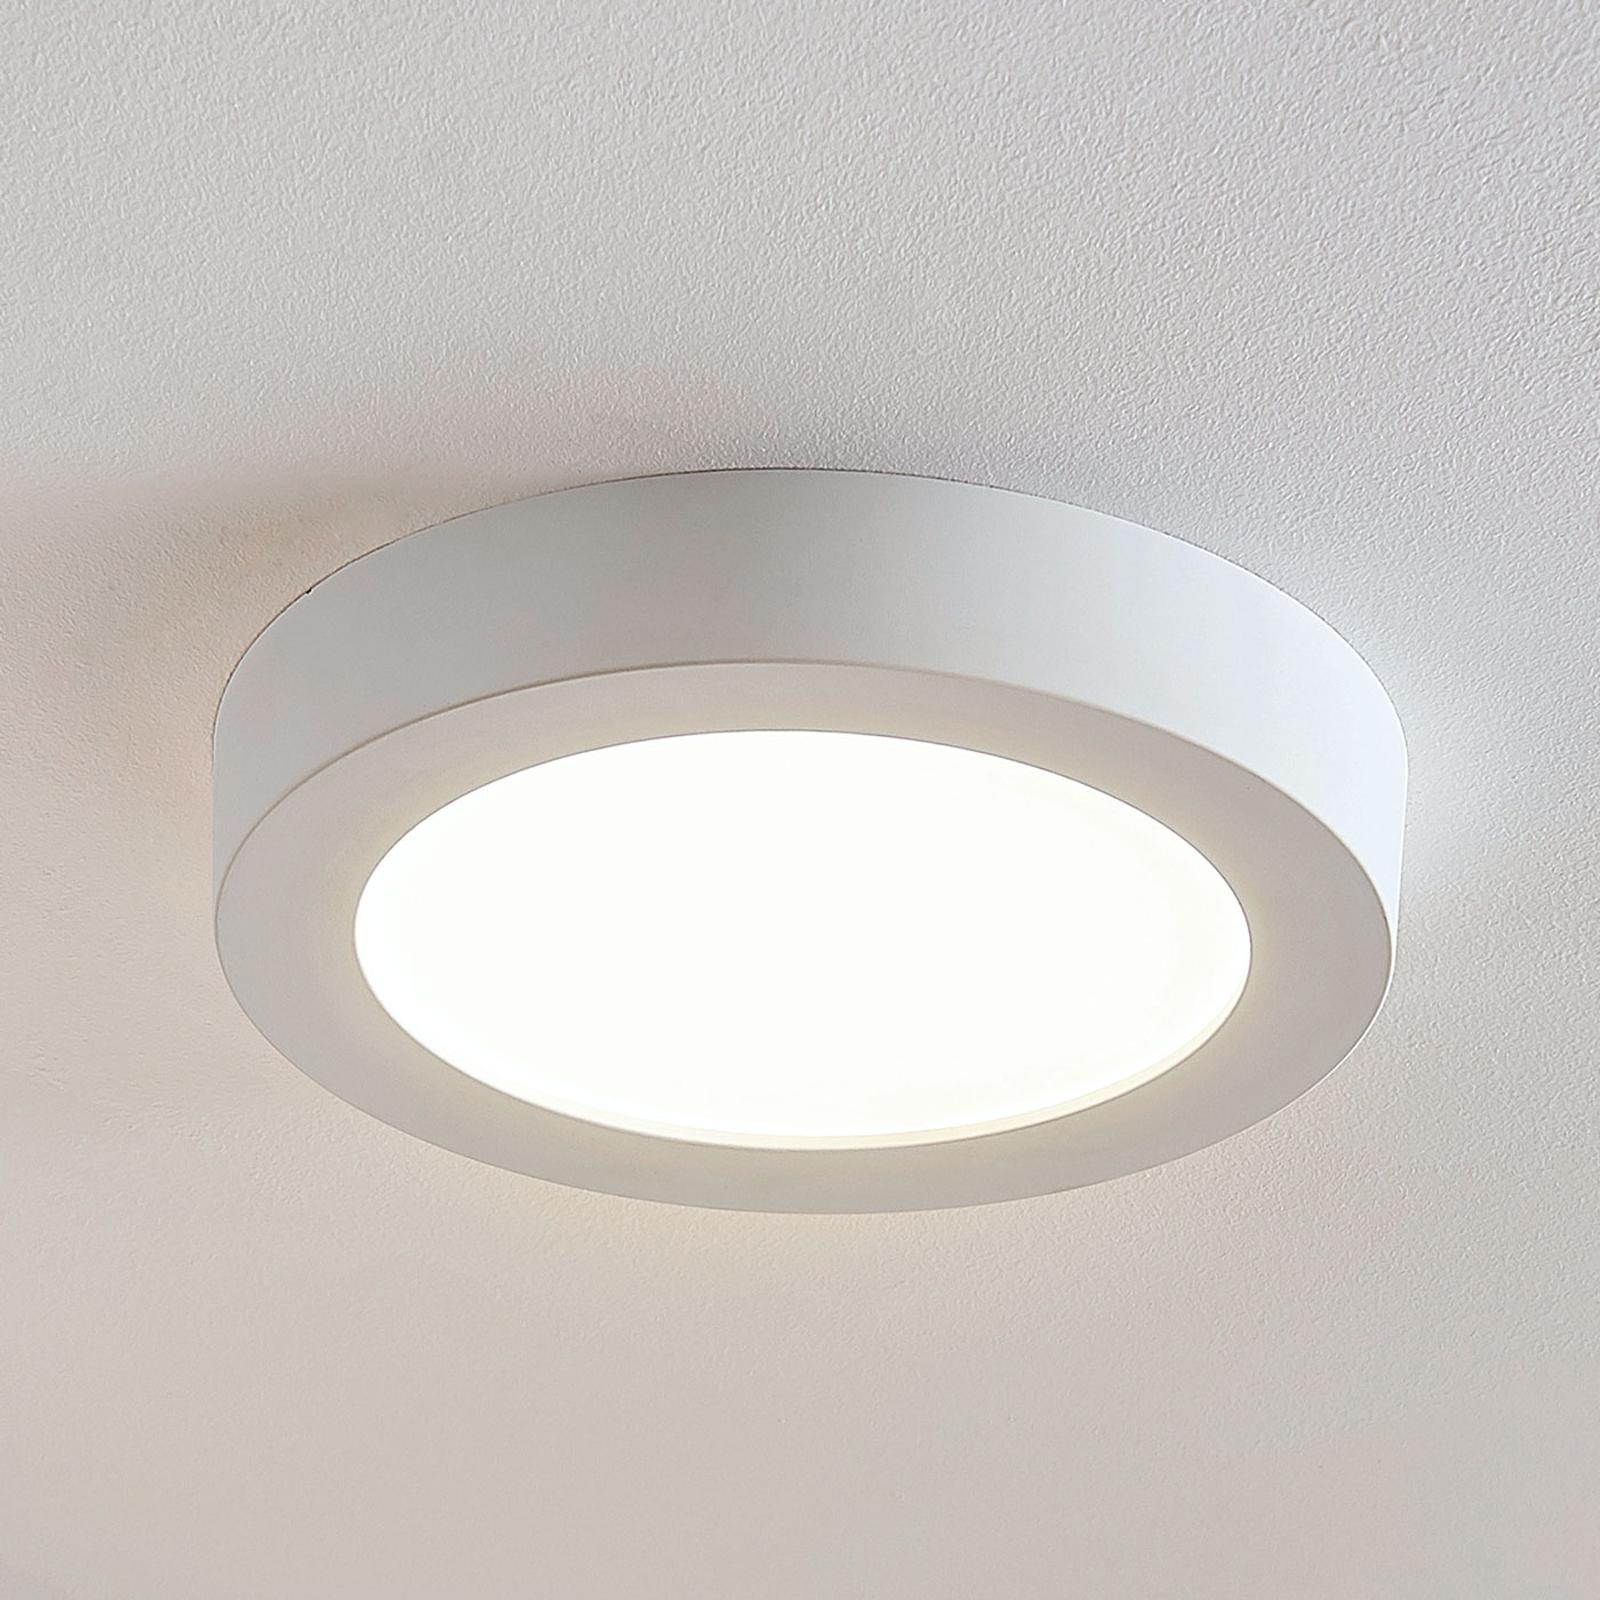 LED plafondlamp Marlo wit 3.000K rond 25,2 cm